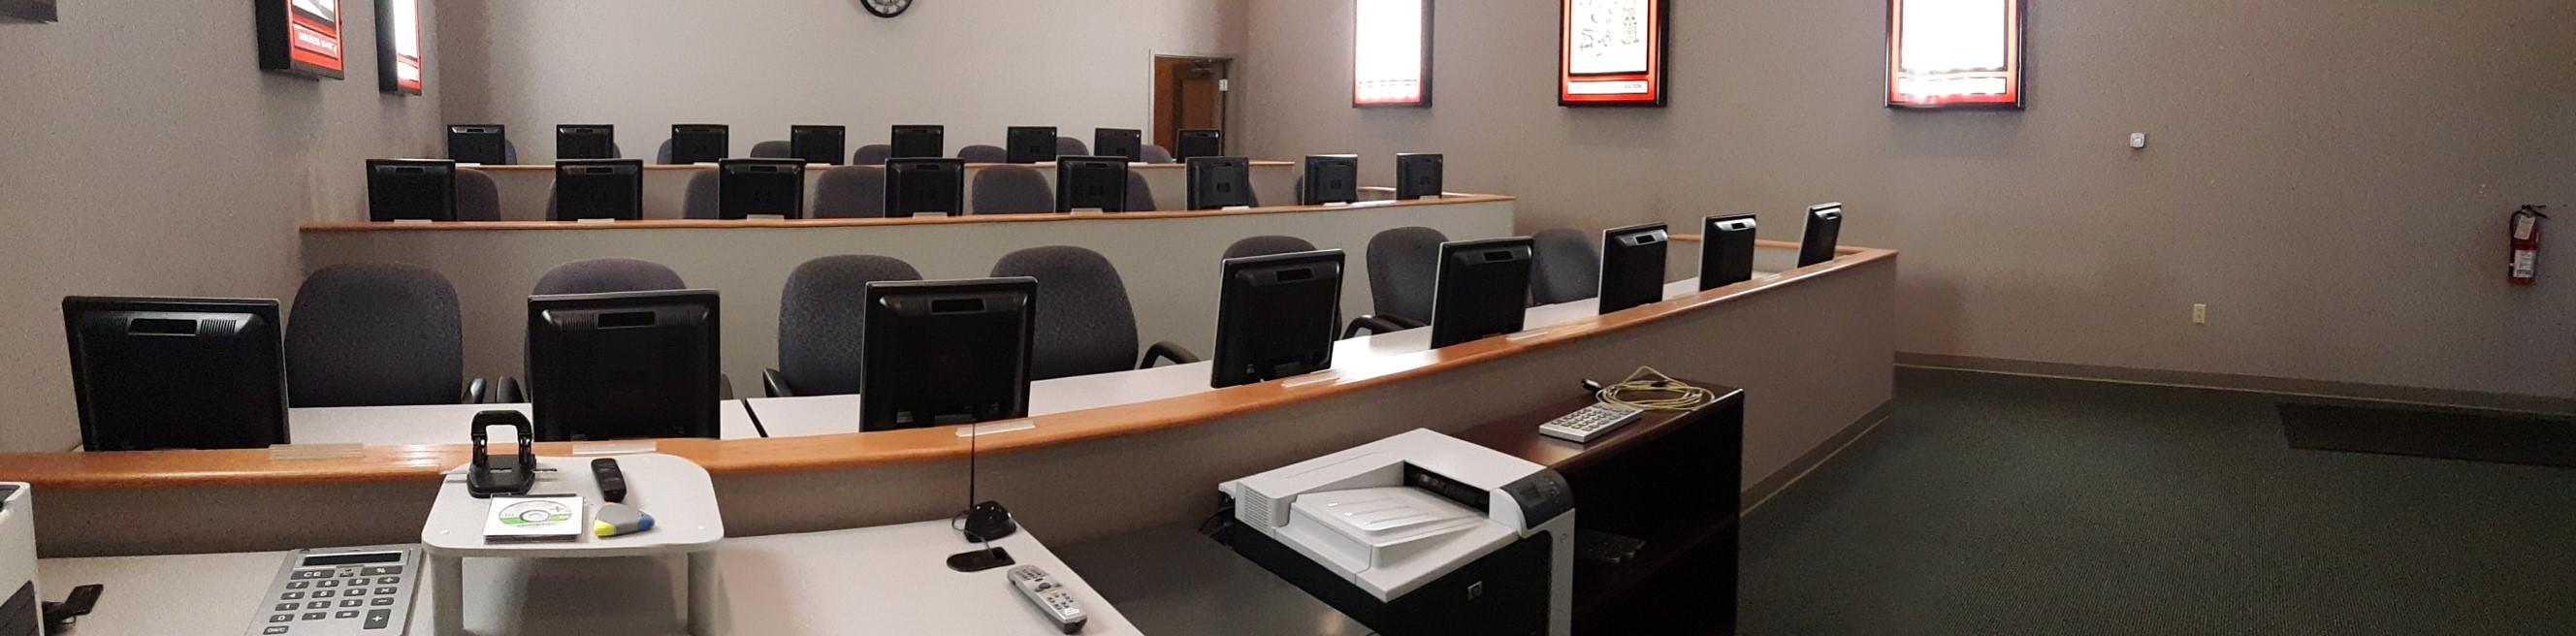 Training room at elliTek University